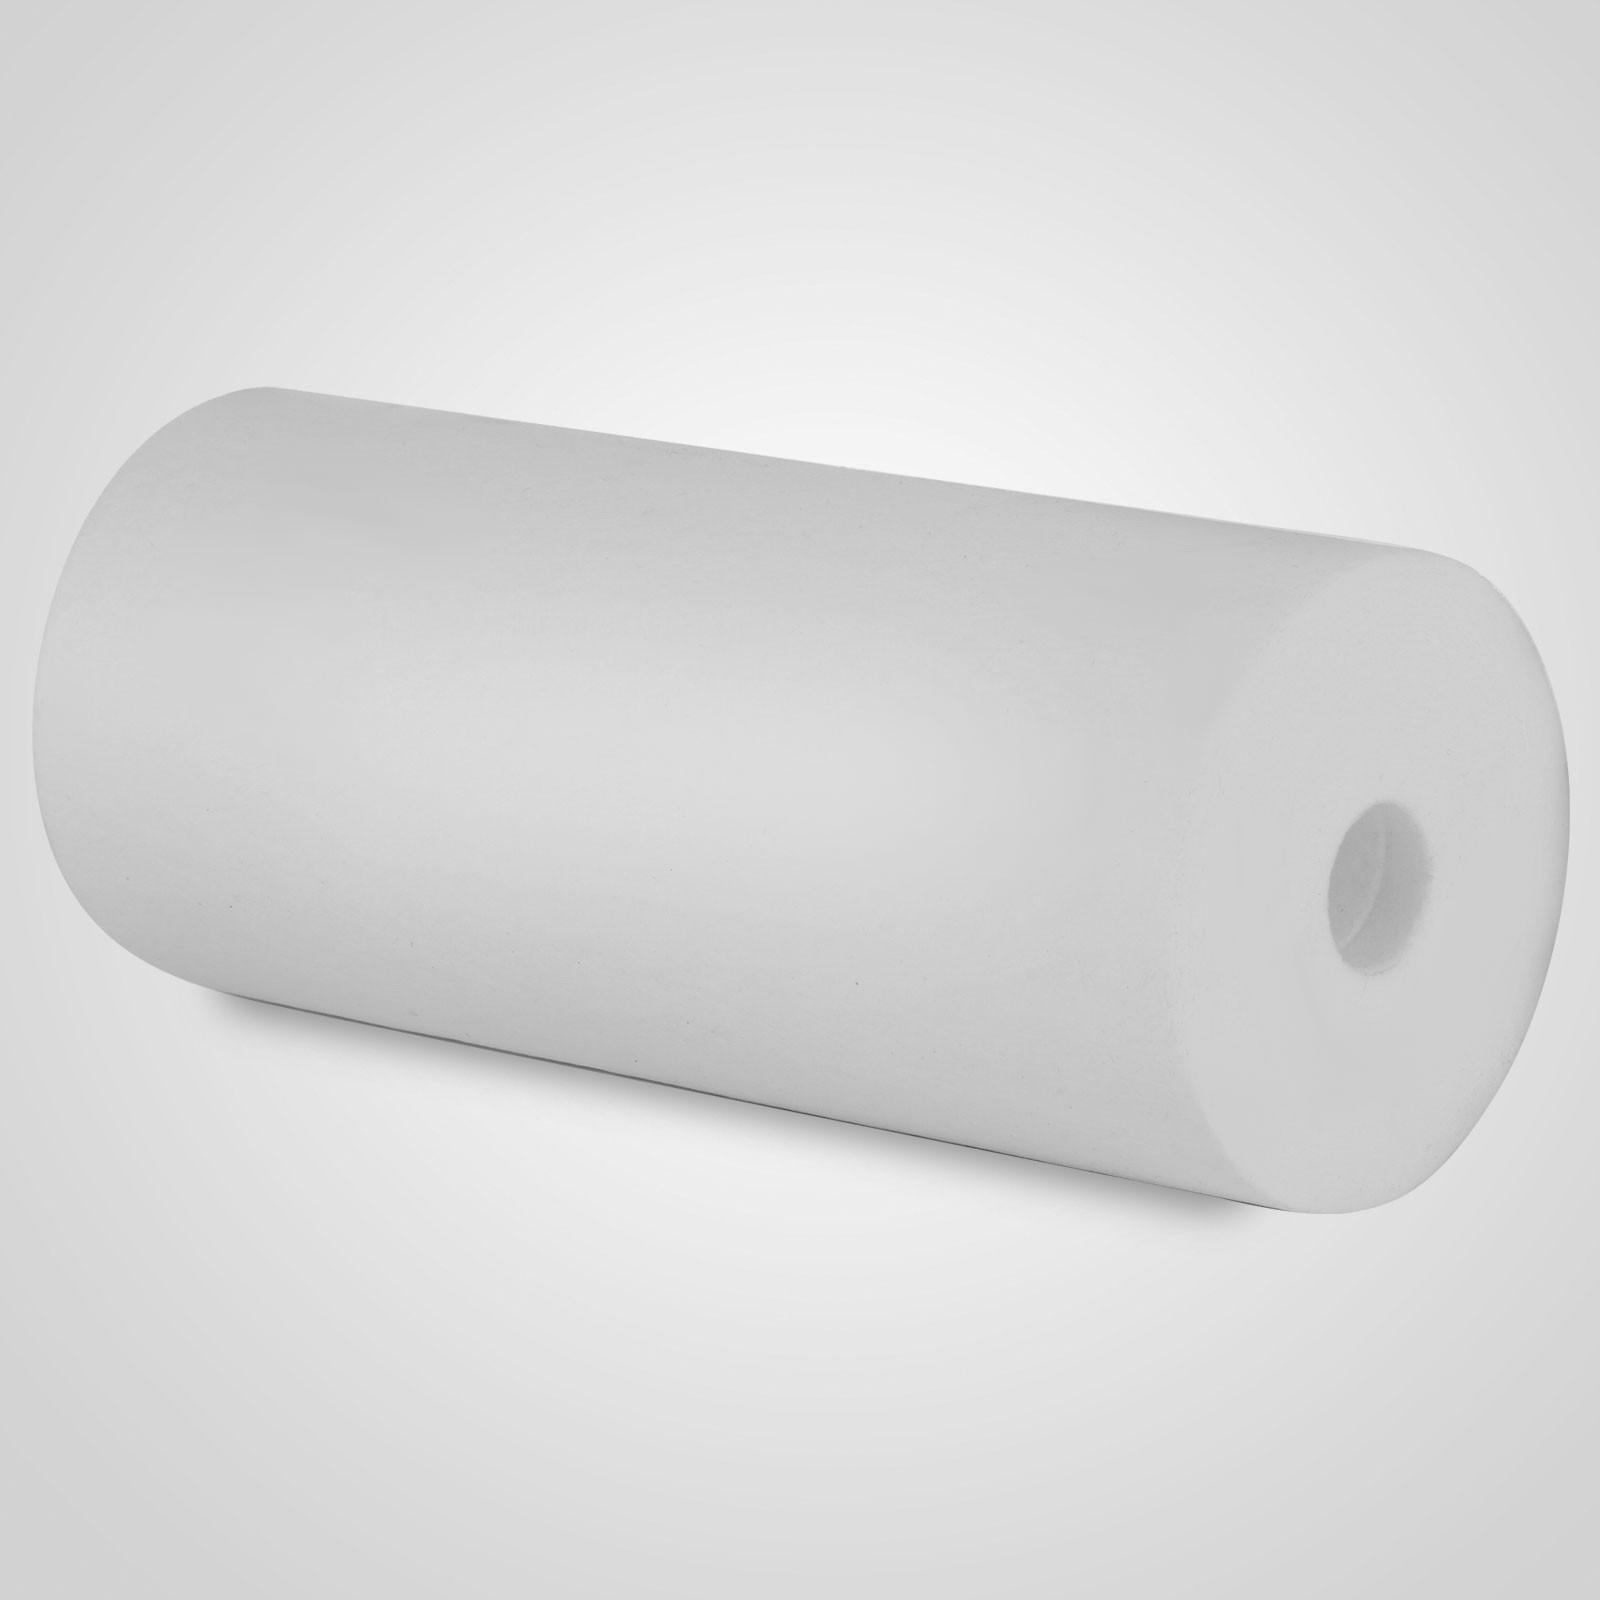 20Pcs-Cartouche-Filtre-a-eau-5-Micron-10-034-X-4-5-034-as-Brita-Bobine-Anti-boue miniature 5